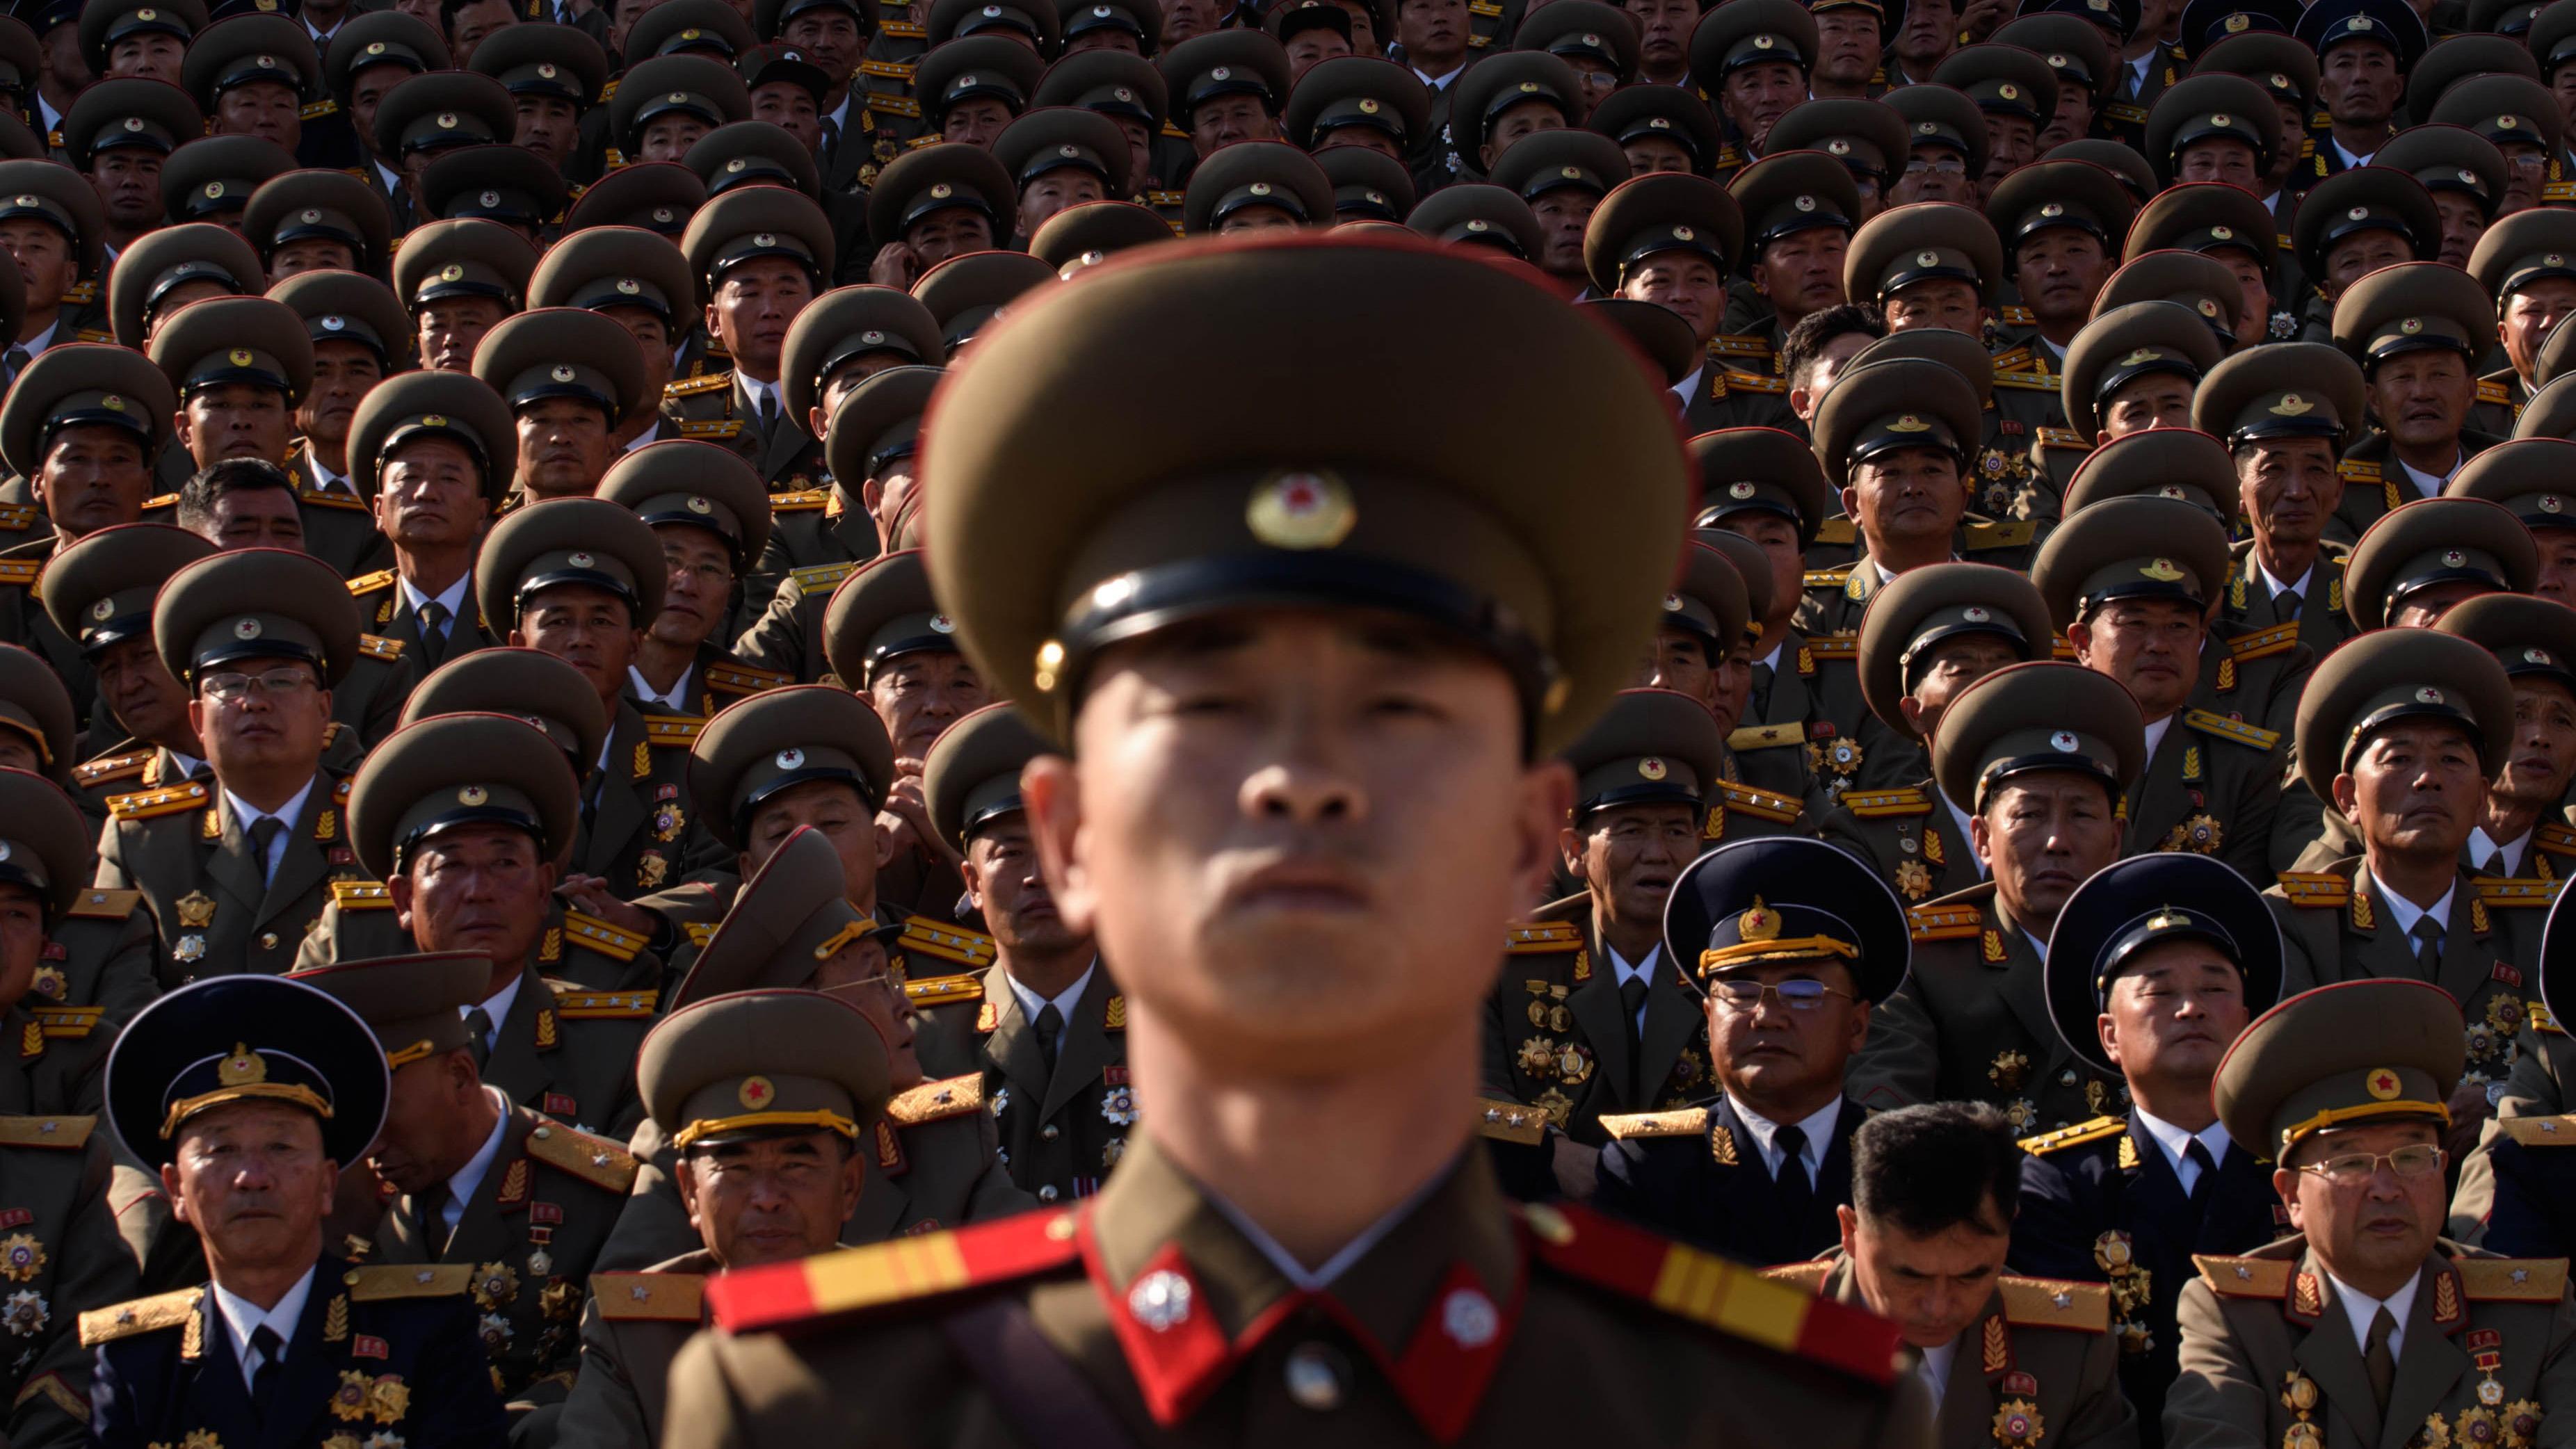 Senior Official at North Korean Spy Agency Flees to South Korea